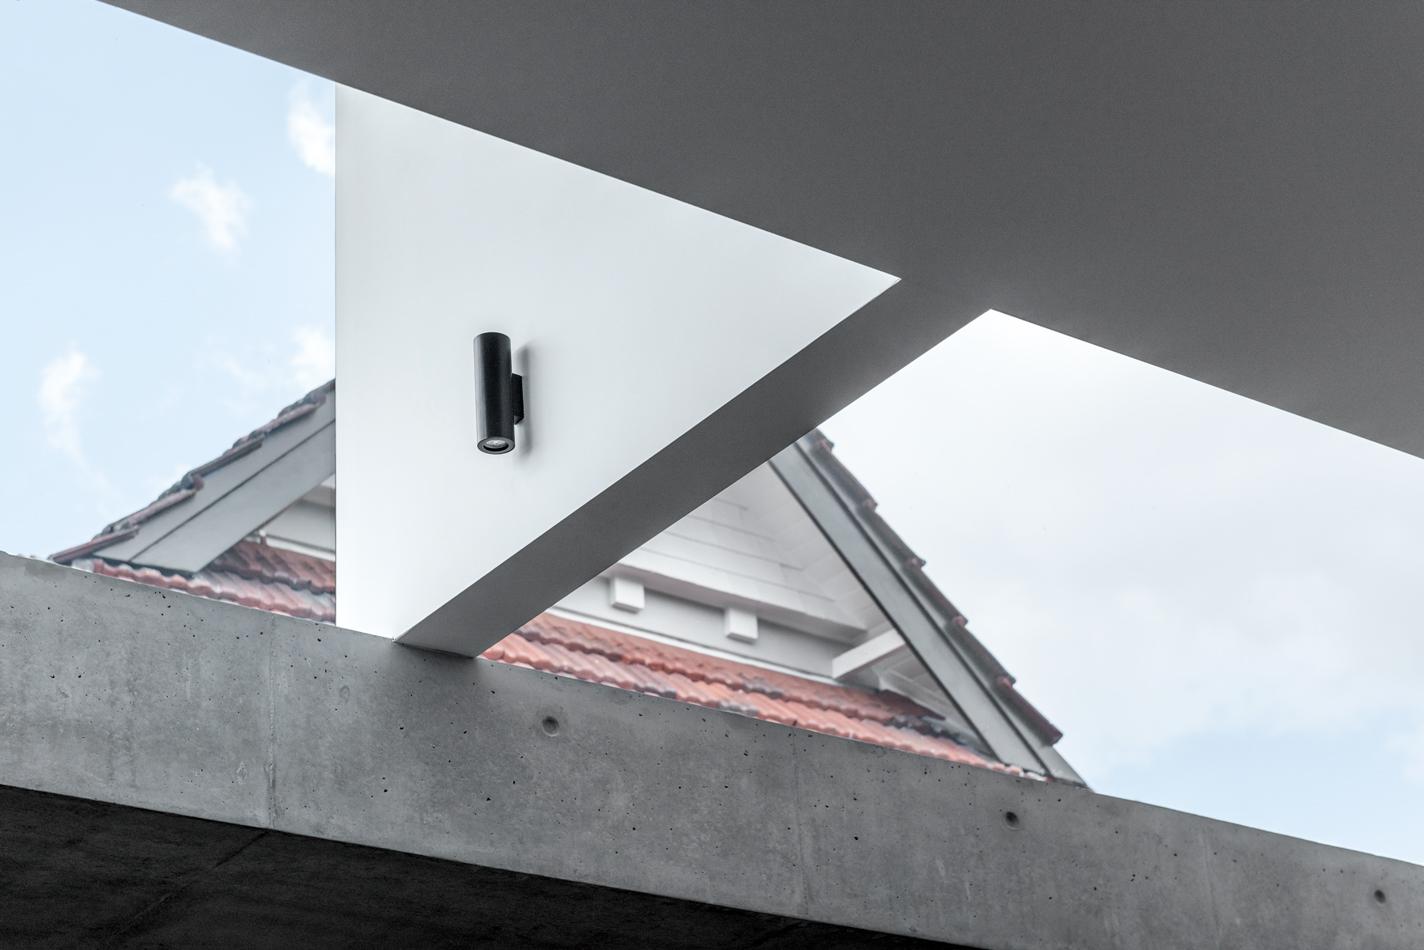 the-terrace-shaun-lockyer-architects-the-design-emotive-14.jpg